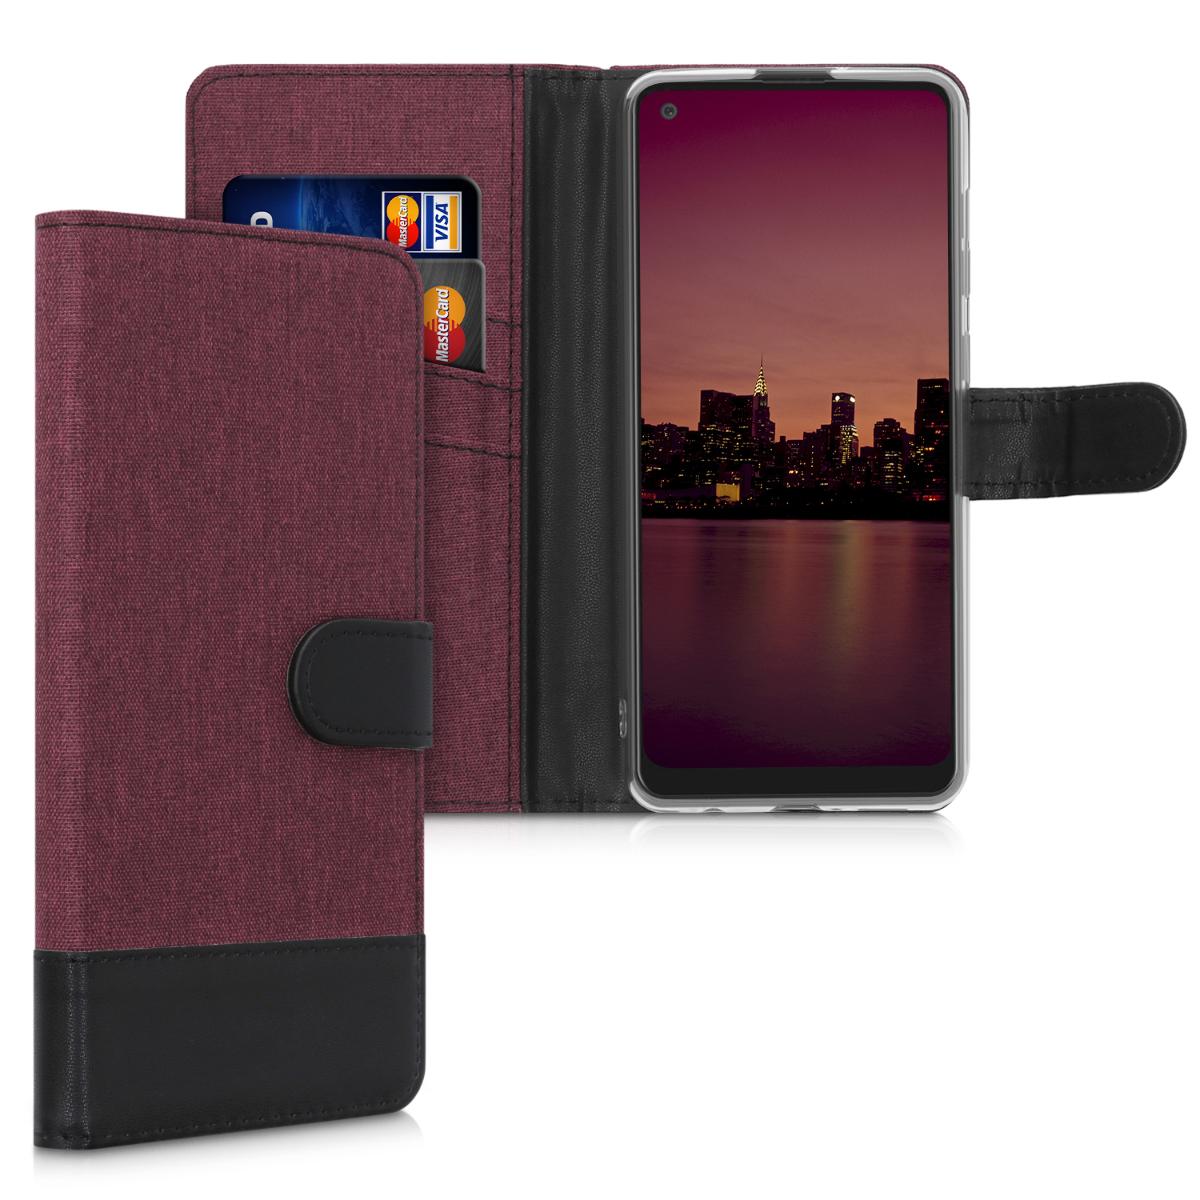 Fabricpouzdro pro Samsung A21s - tmavě červené / černé